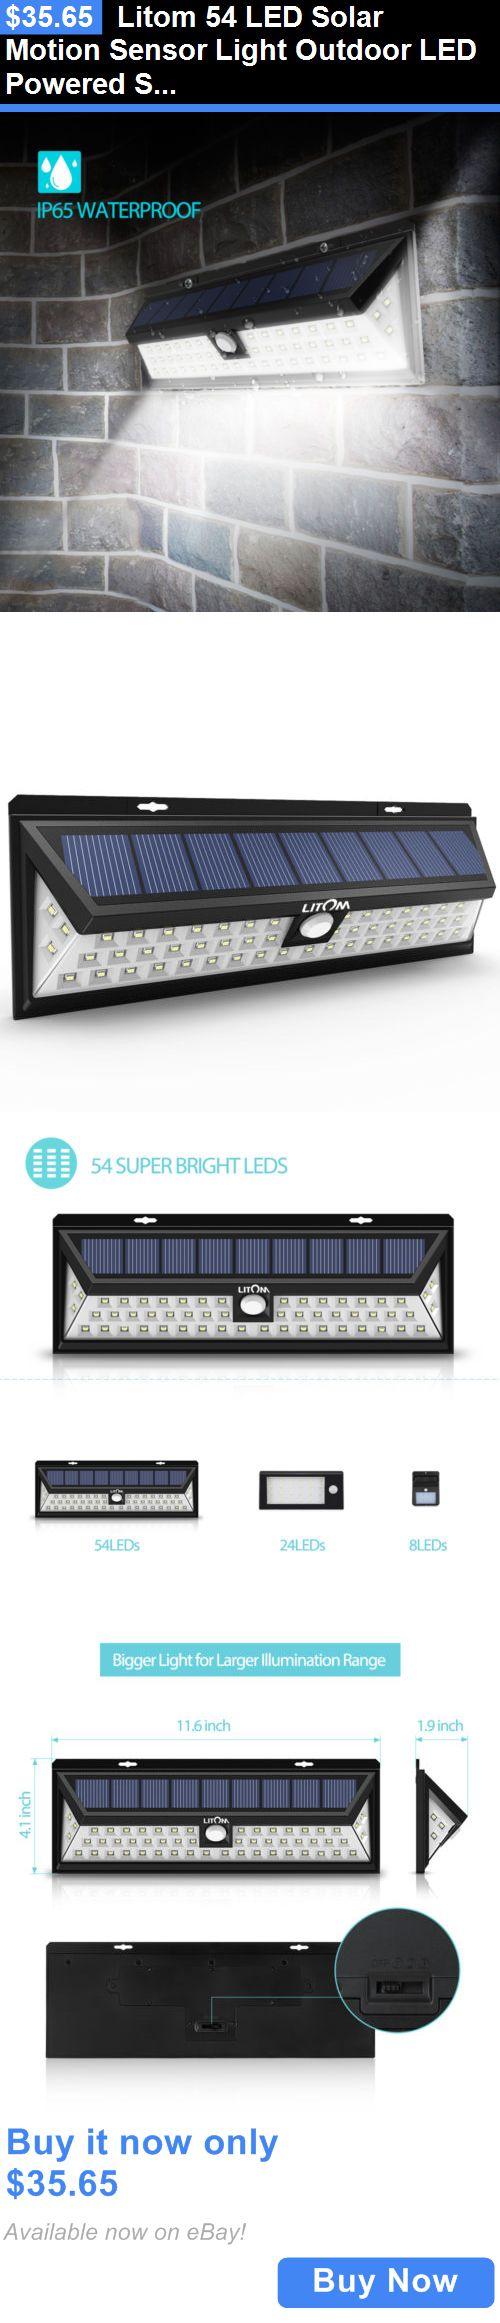 farm and garden: Litom 54 Led Solar Motion Sensor Light Outdoor Led Powered Security Lighting Us BUY IT NOW ONLY: $35.65